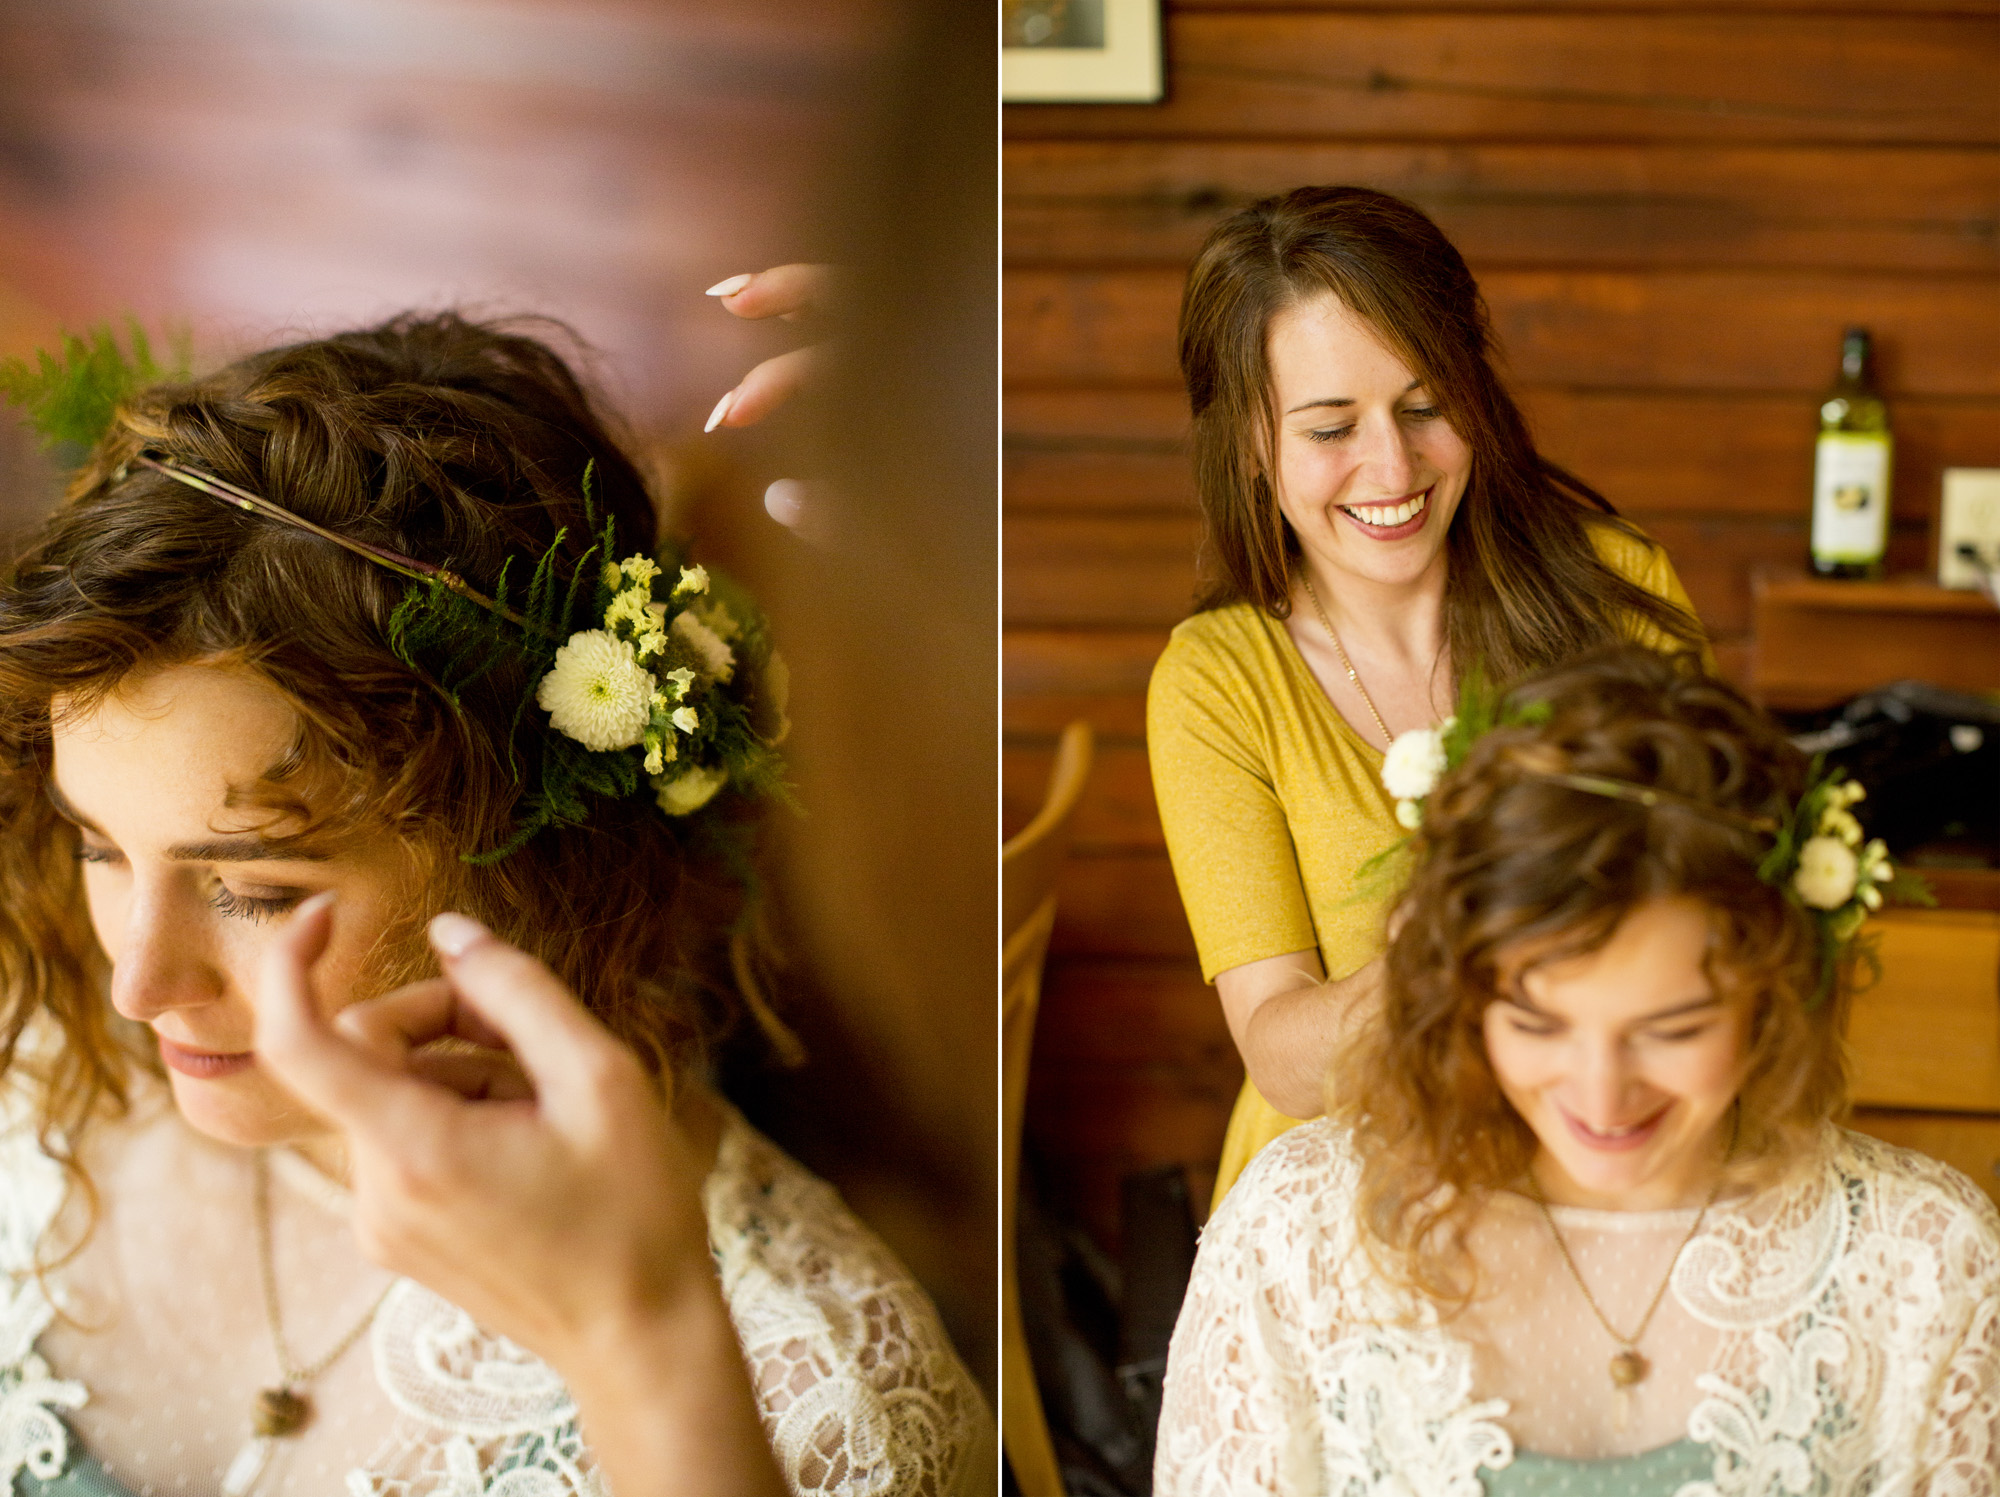 Seriously_Sabrina_Photography_Red_River_Gorge_Kentucky_Wedding_ShawnDana58.jpg